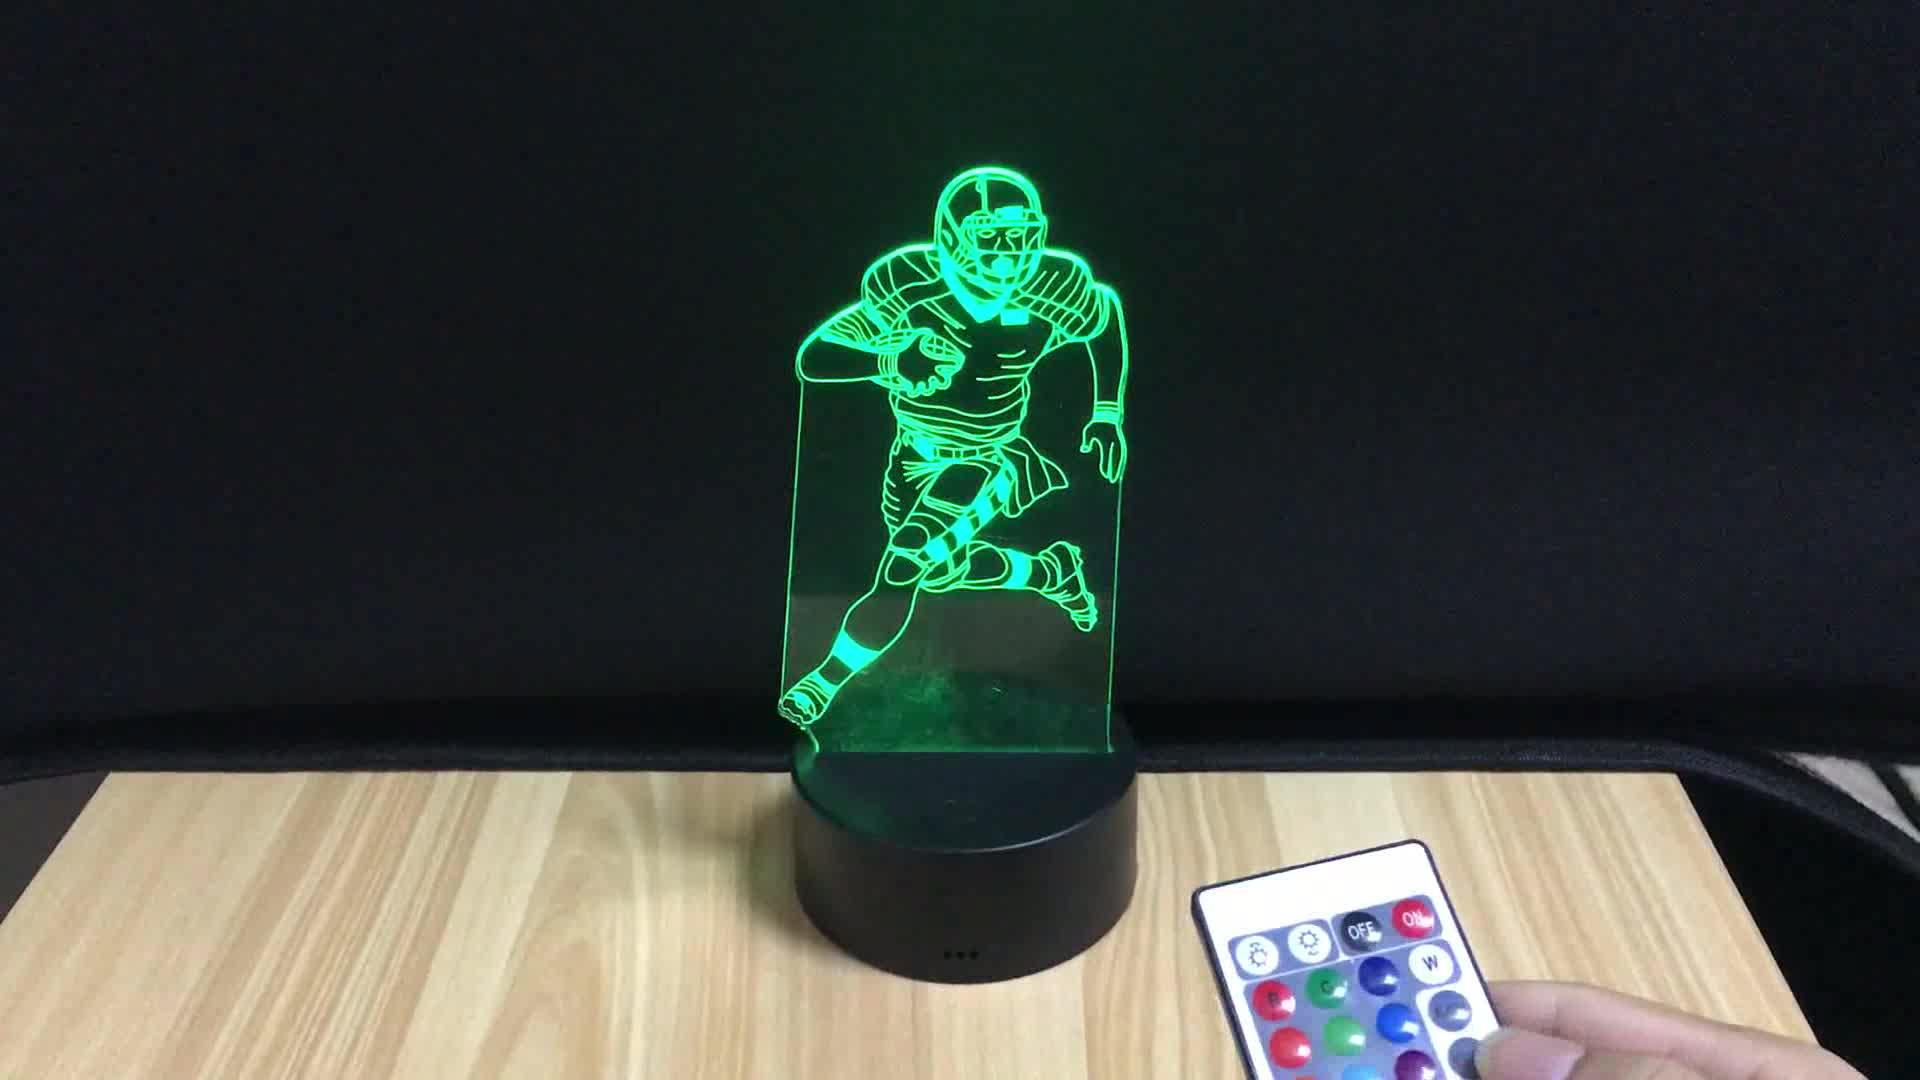 Kobe บาสเกตบอล shape Night Light 3D Vision อะคริลิค 16 สีเปลี่ยน USB ข้างเตียงโคมไฟสร้างสรรค์